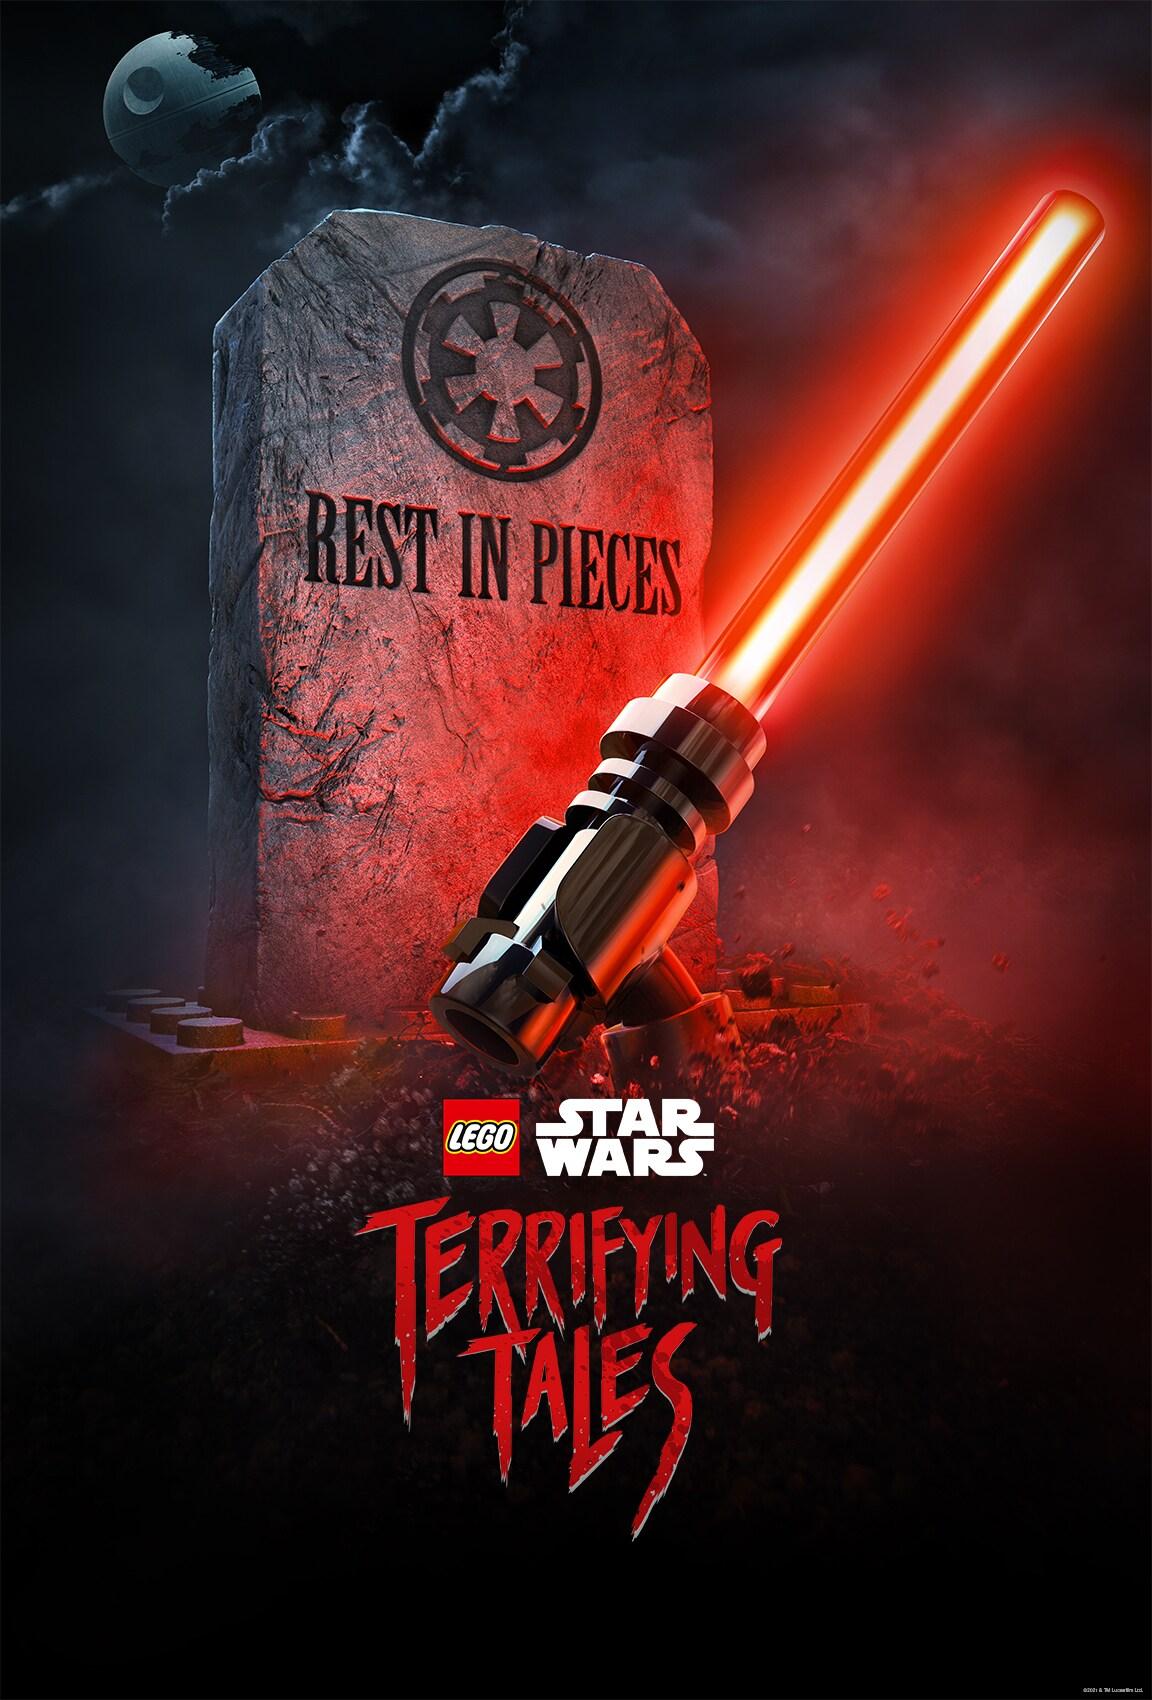 LEGO Star Wars Terrifying Tales on Disney Plus